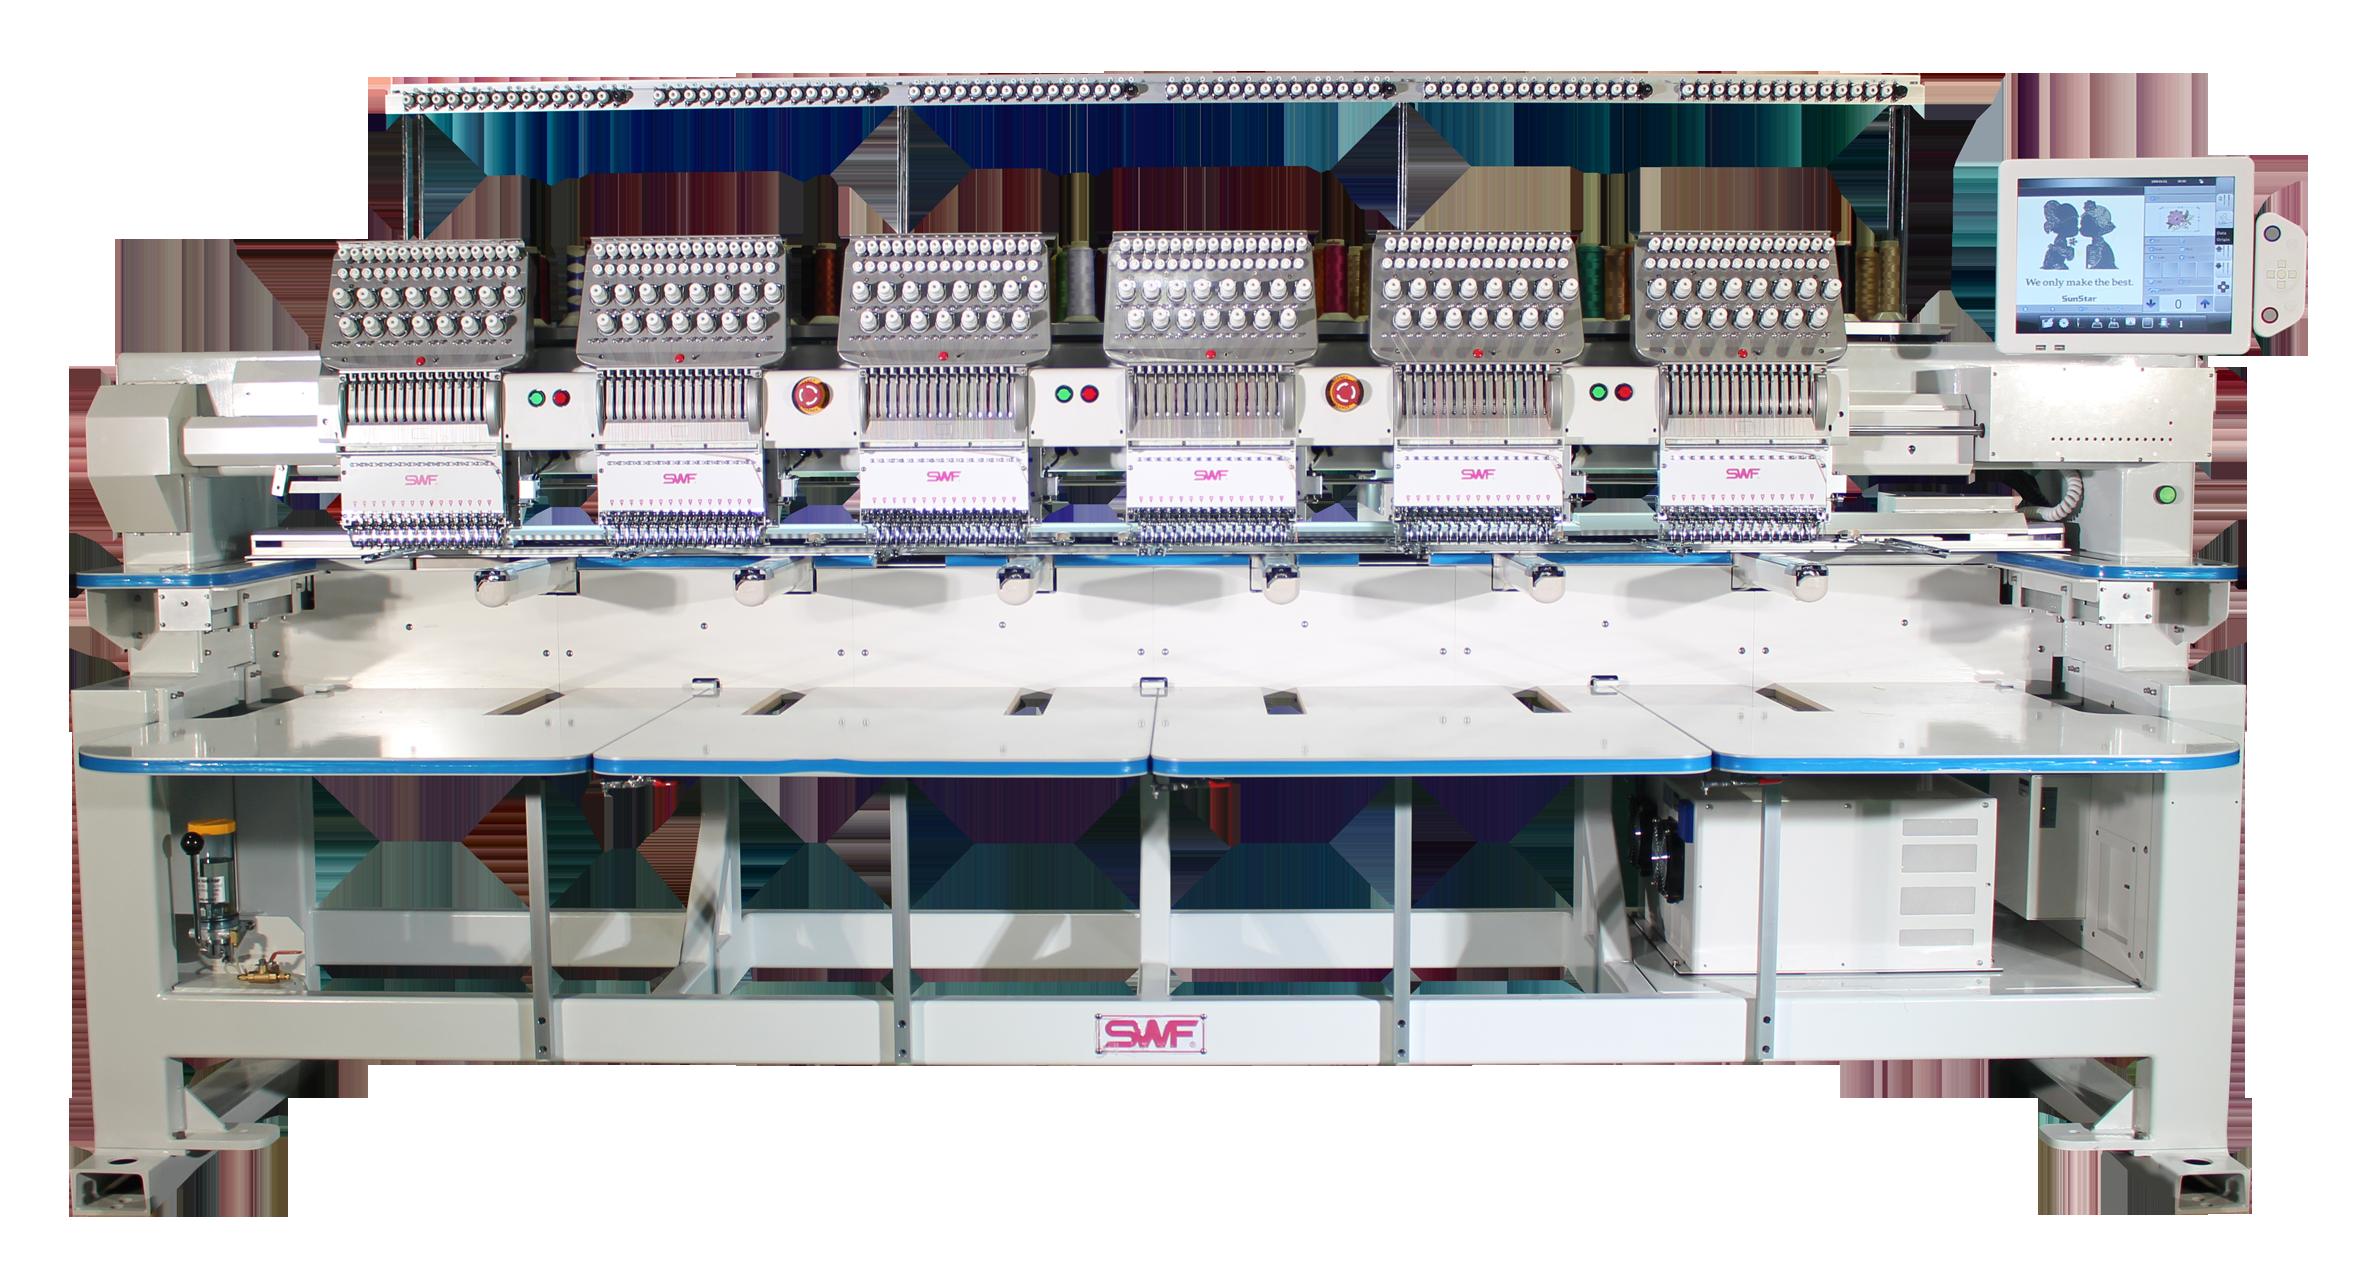 SWF Multi-Head Embroidery Machines